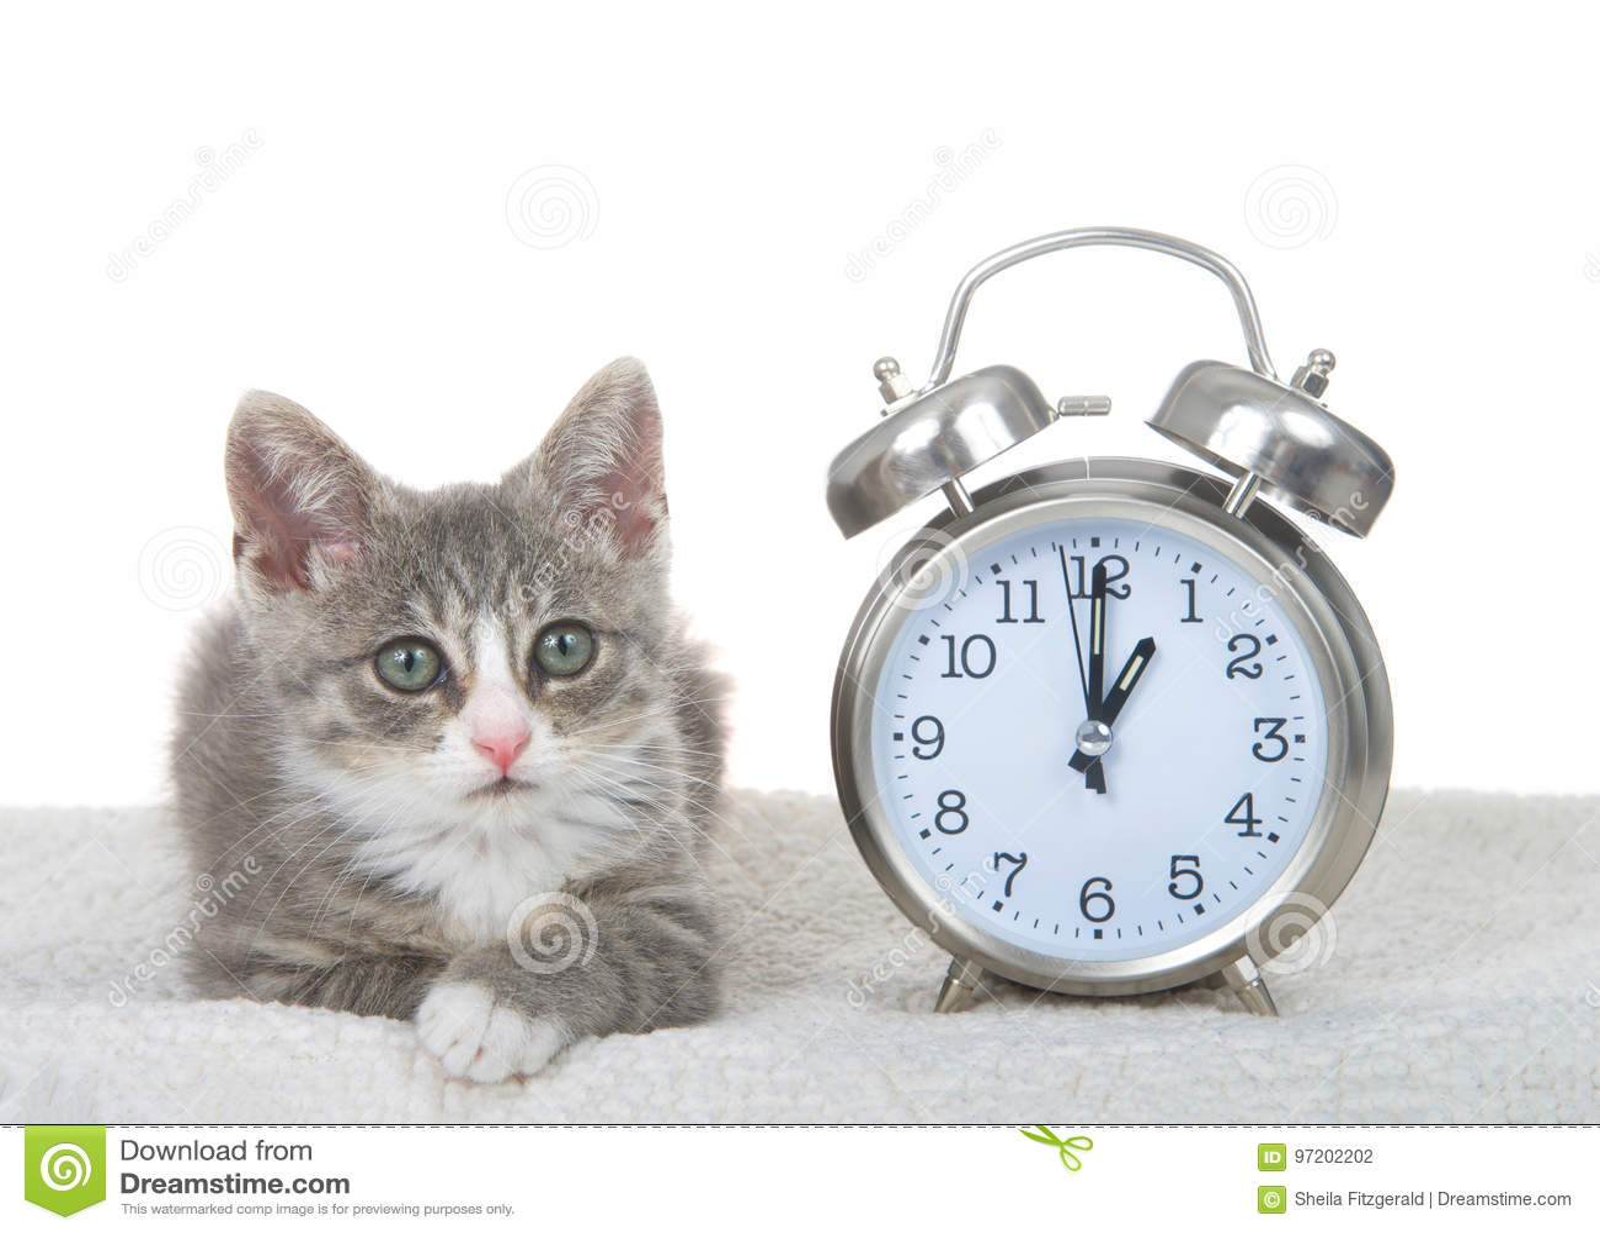 Tabby kitten next to clock on sheepskin bed, daylight savings concept